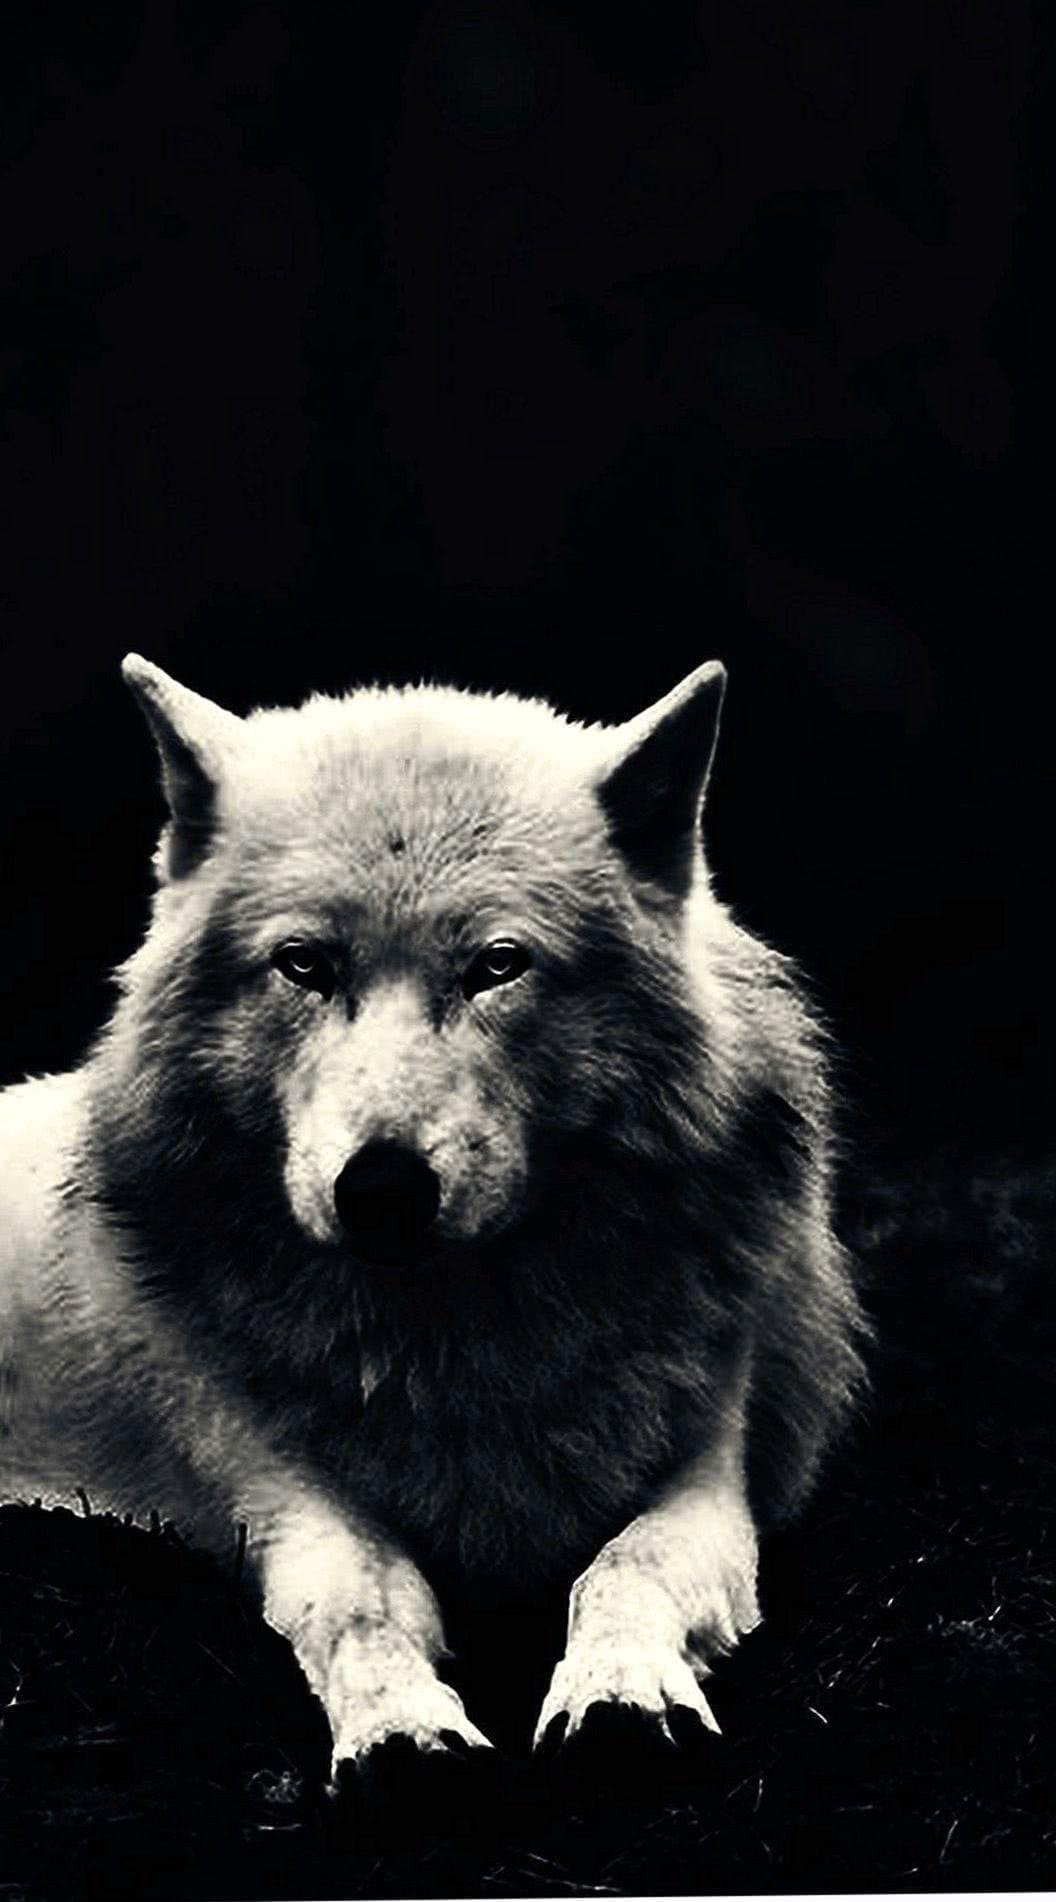 Phone Wallpaper HD Wolf